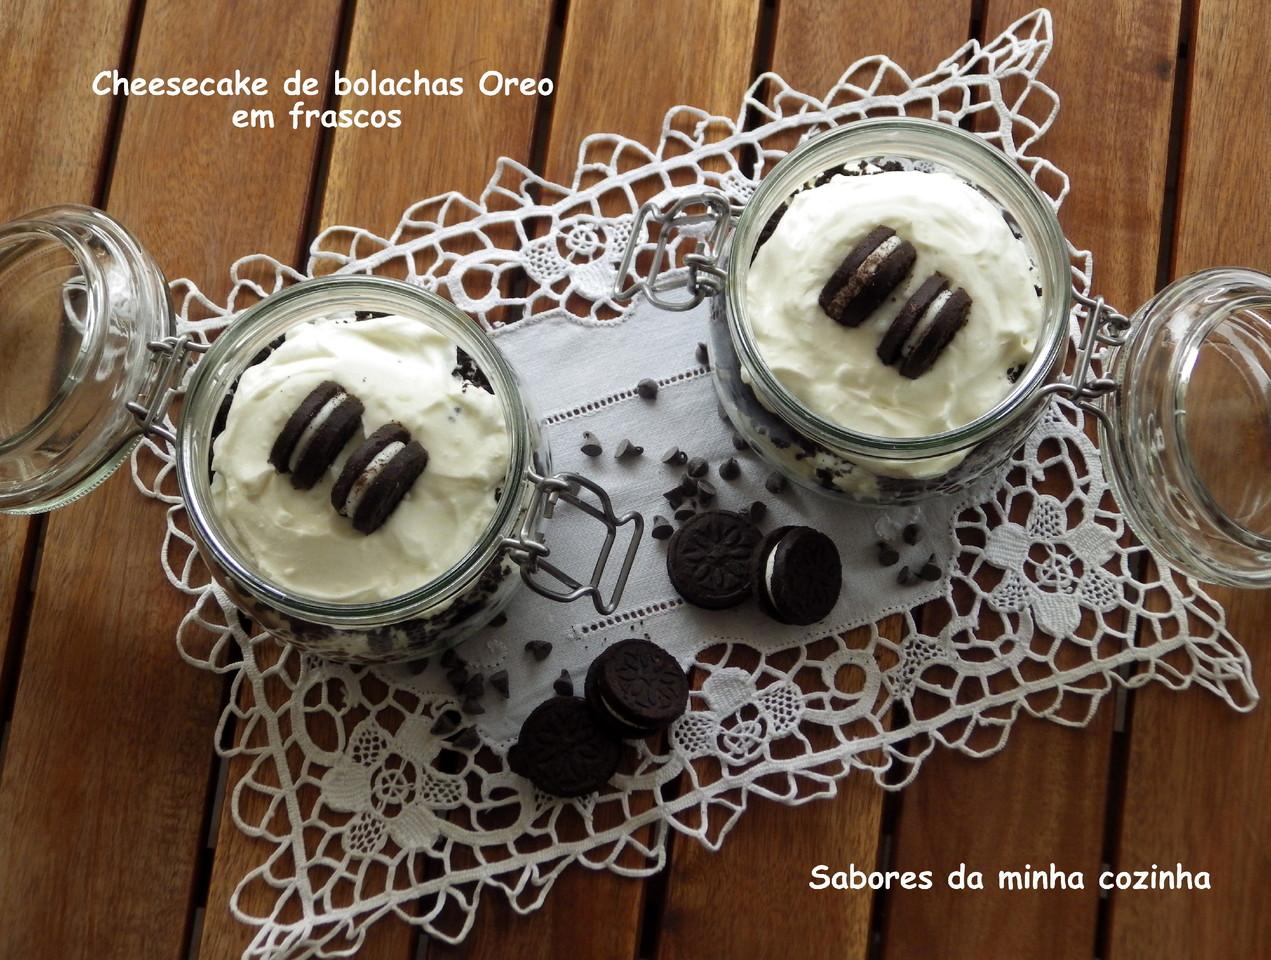 IMGP5732-Cheesecake de bolachas Oreo-Blog.JPG